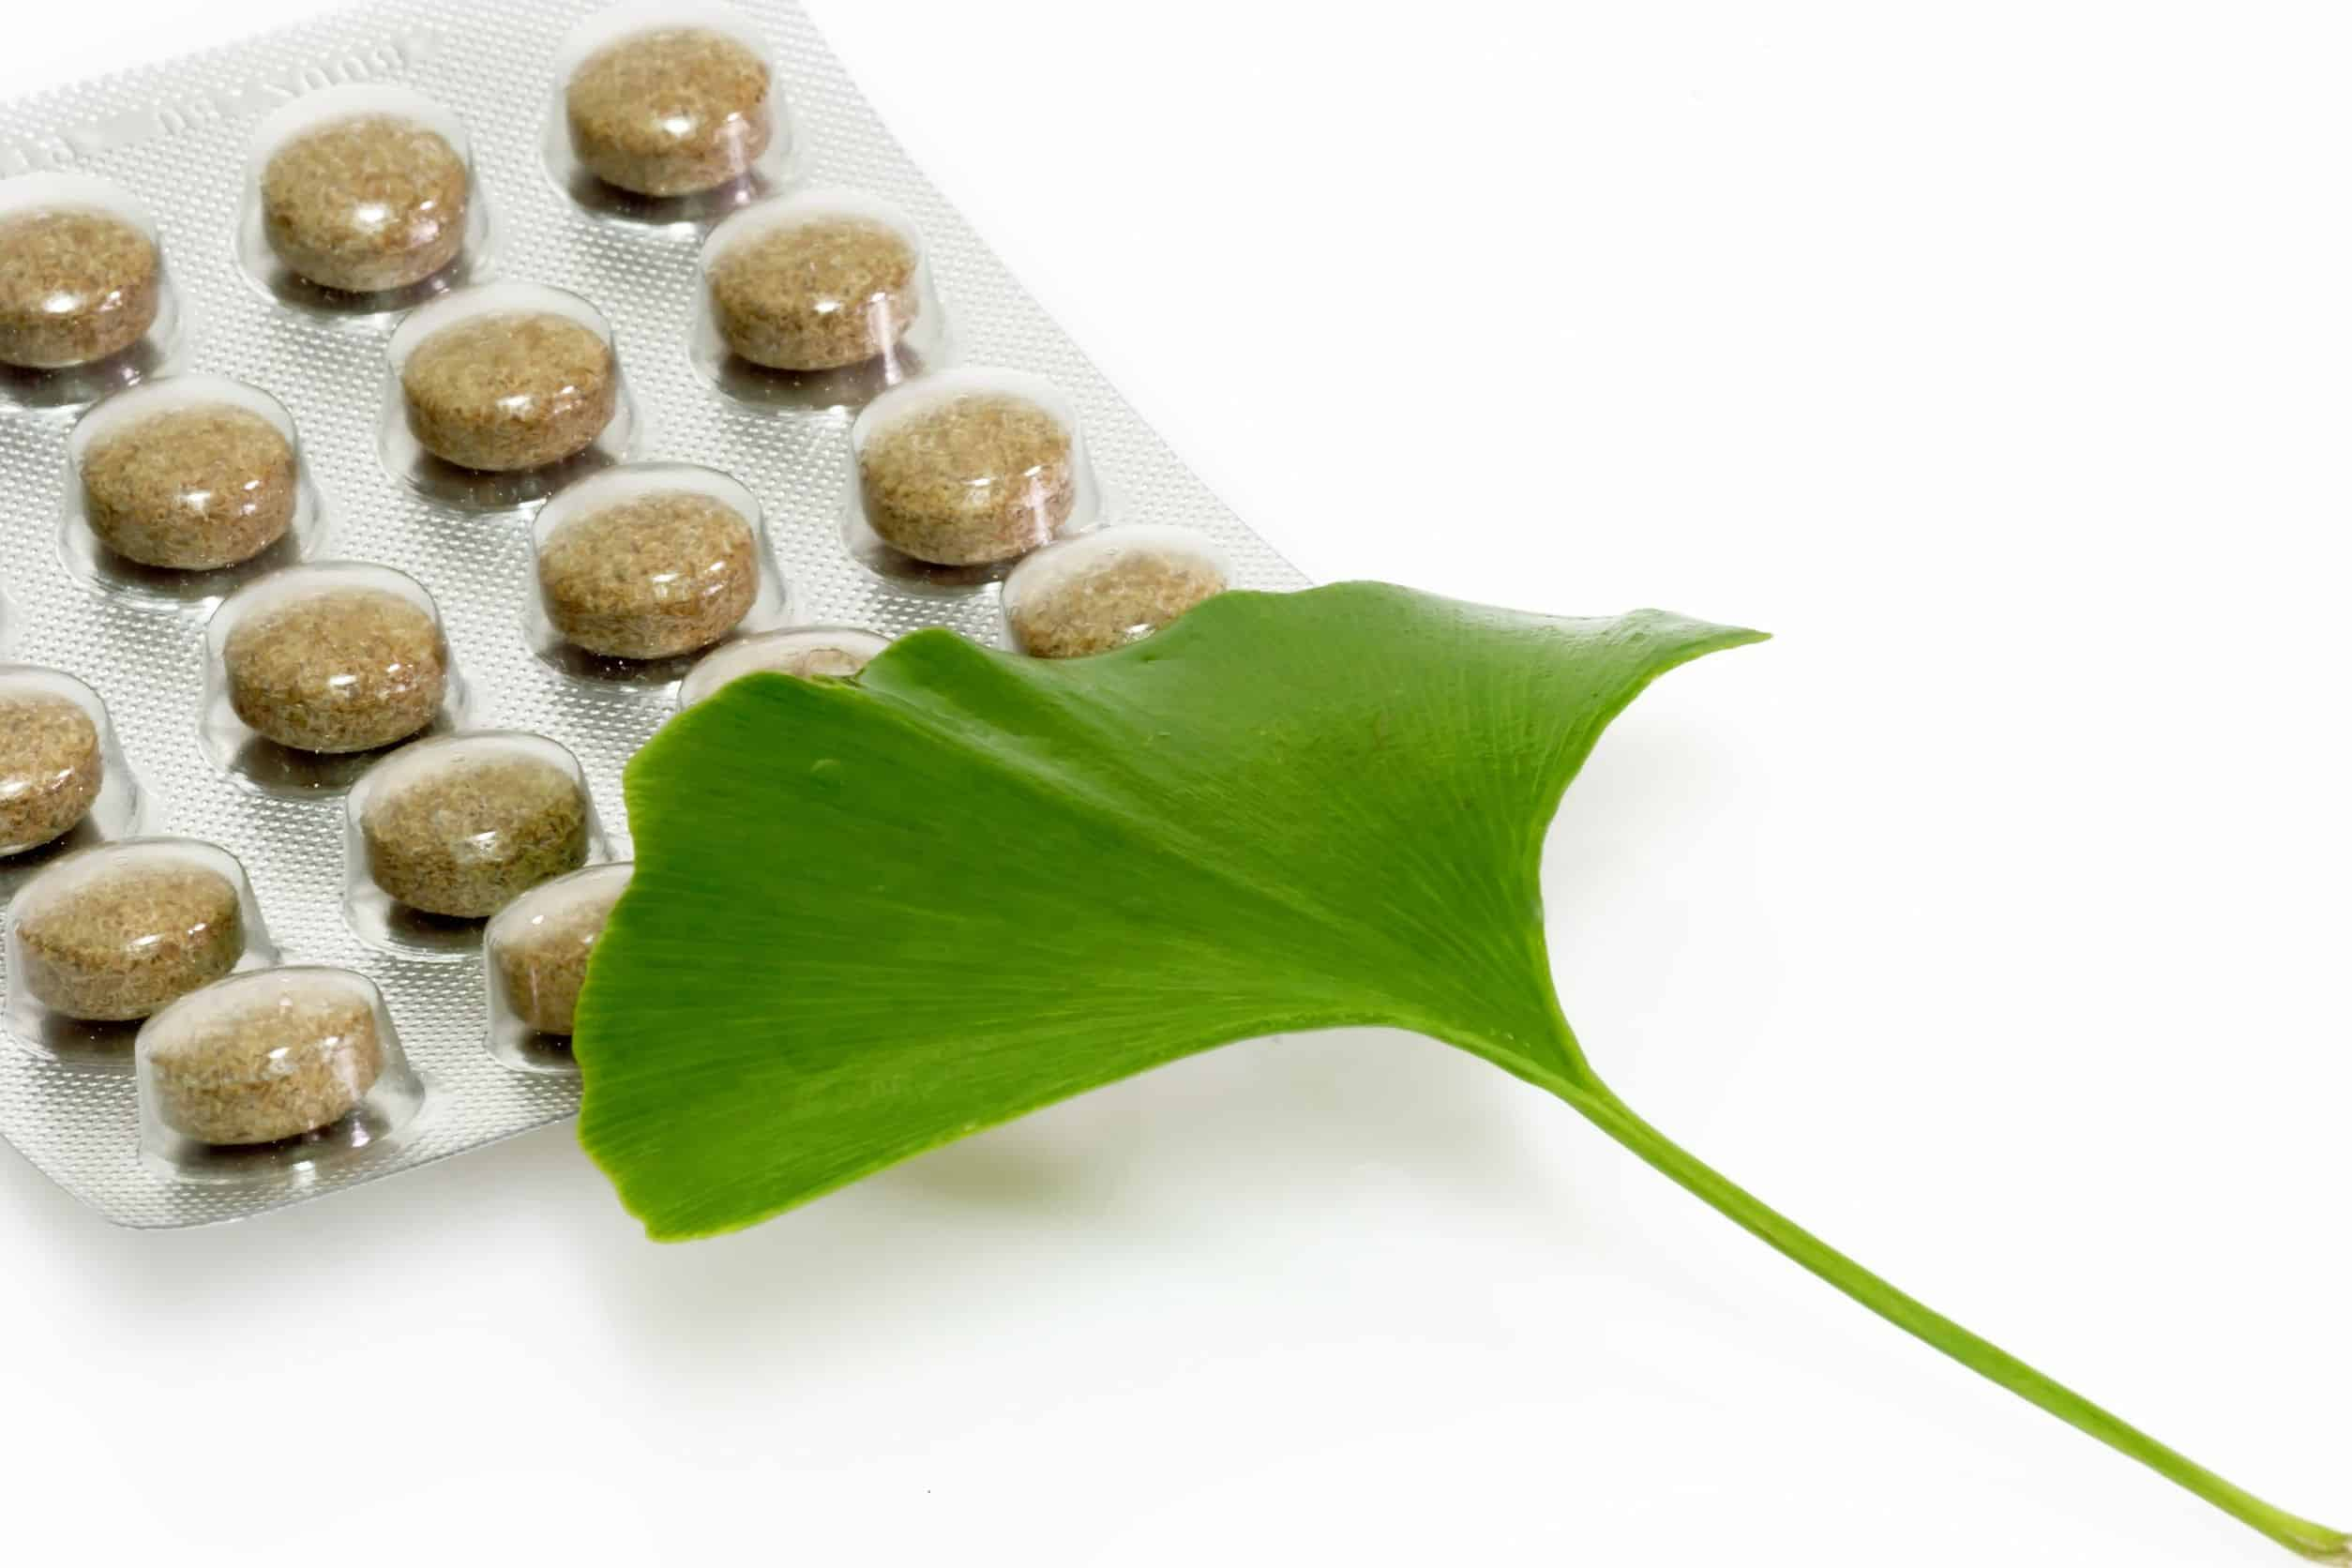 Gingko Tabletten: Test, Wirkung, Anwendung & Studien (05/21)